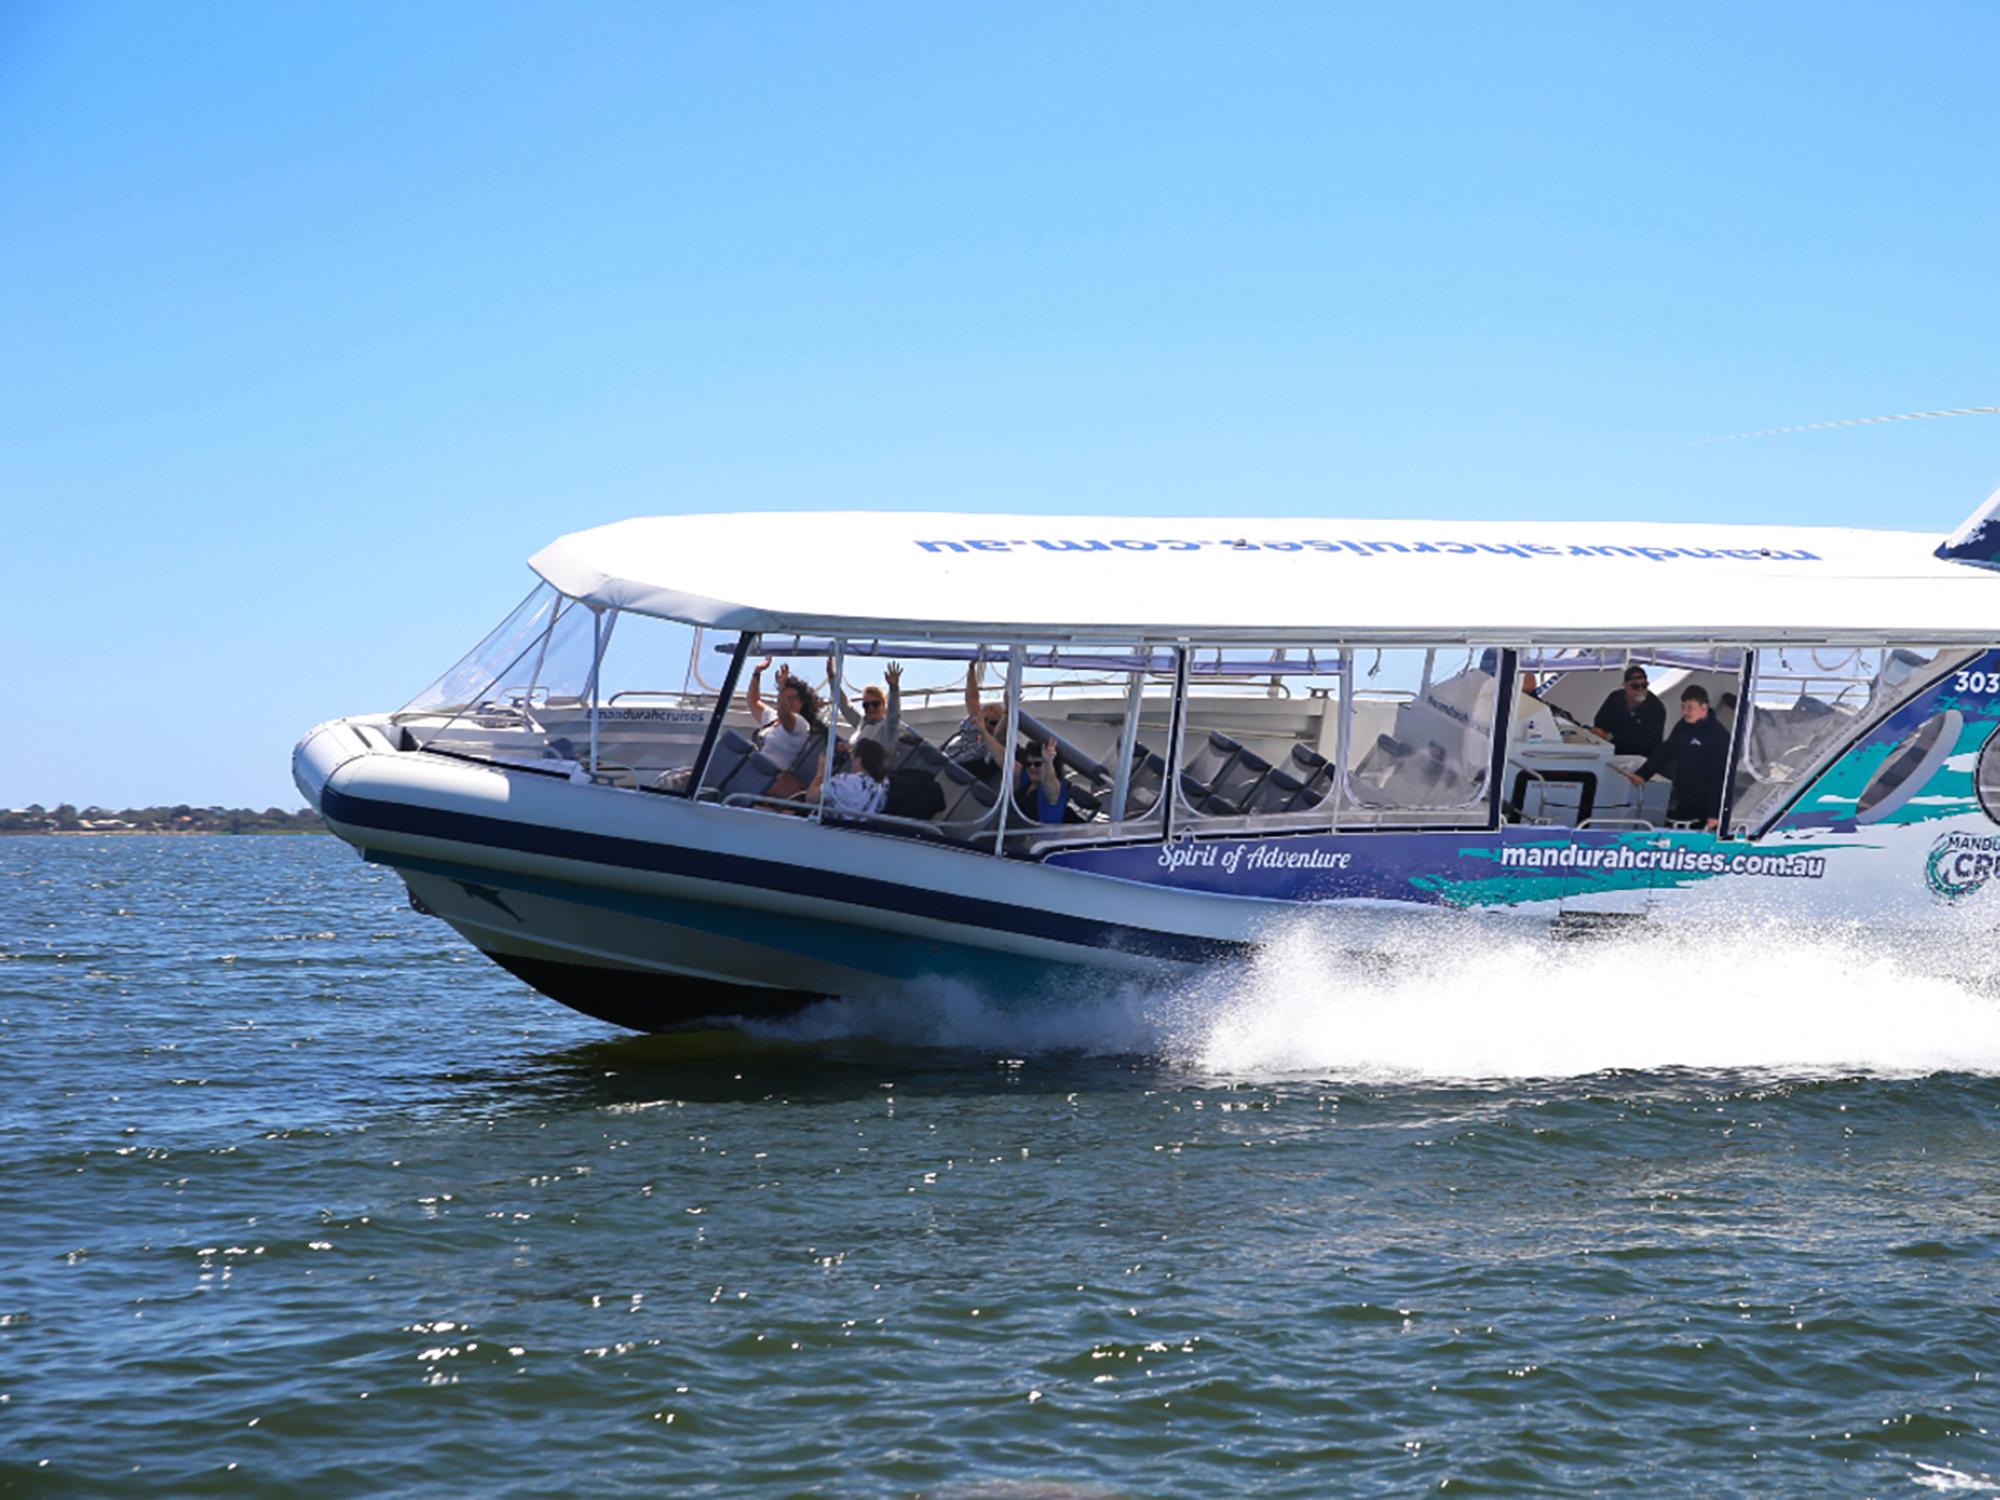 Adrenaline fuelled fun with Mandurah Cruises